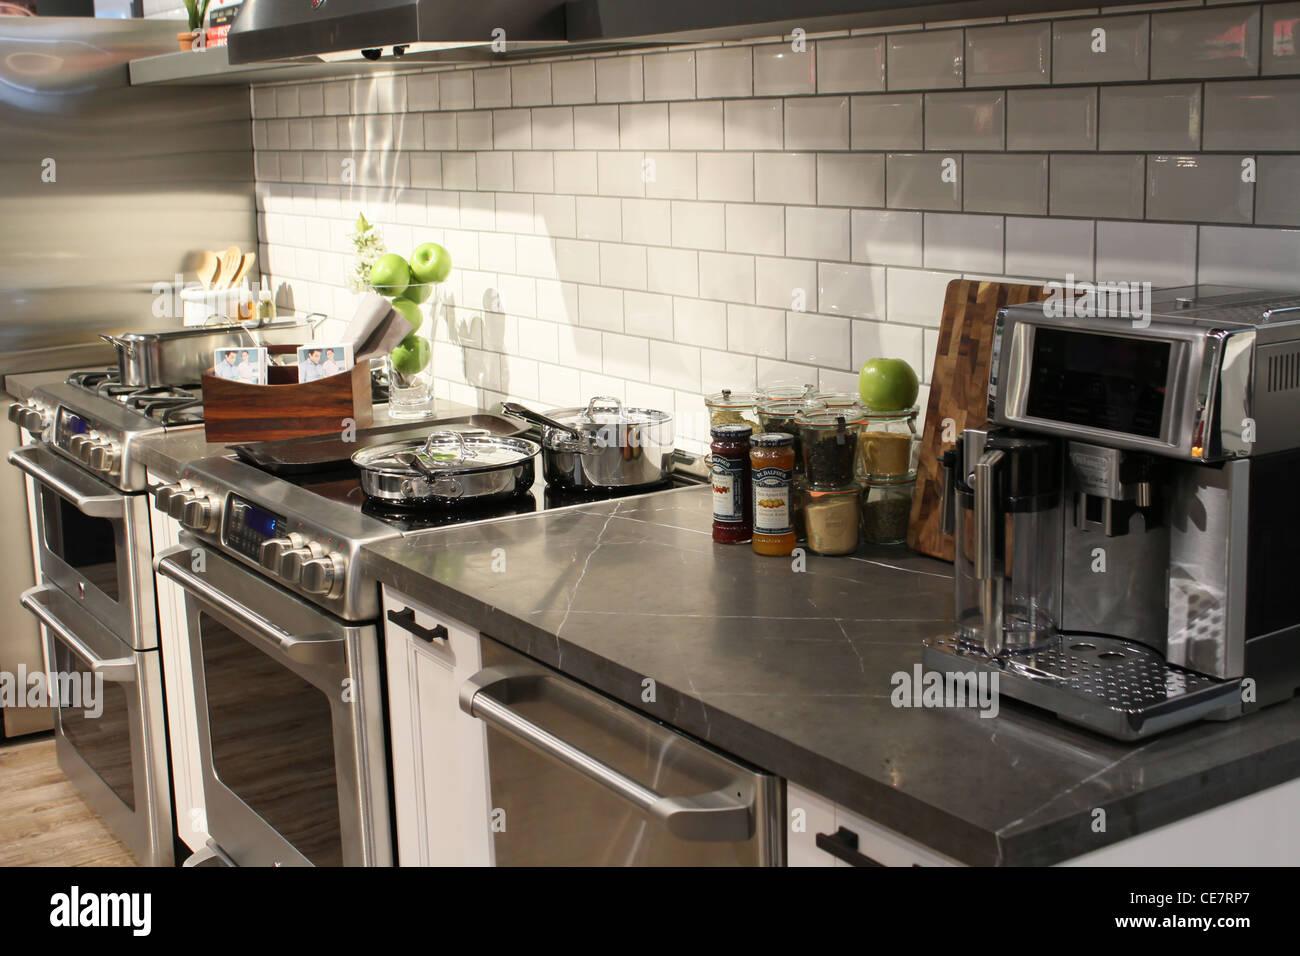 Modern Kitchen Luxury Stainless Steel Appliance Stock Photo Alamy